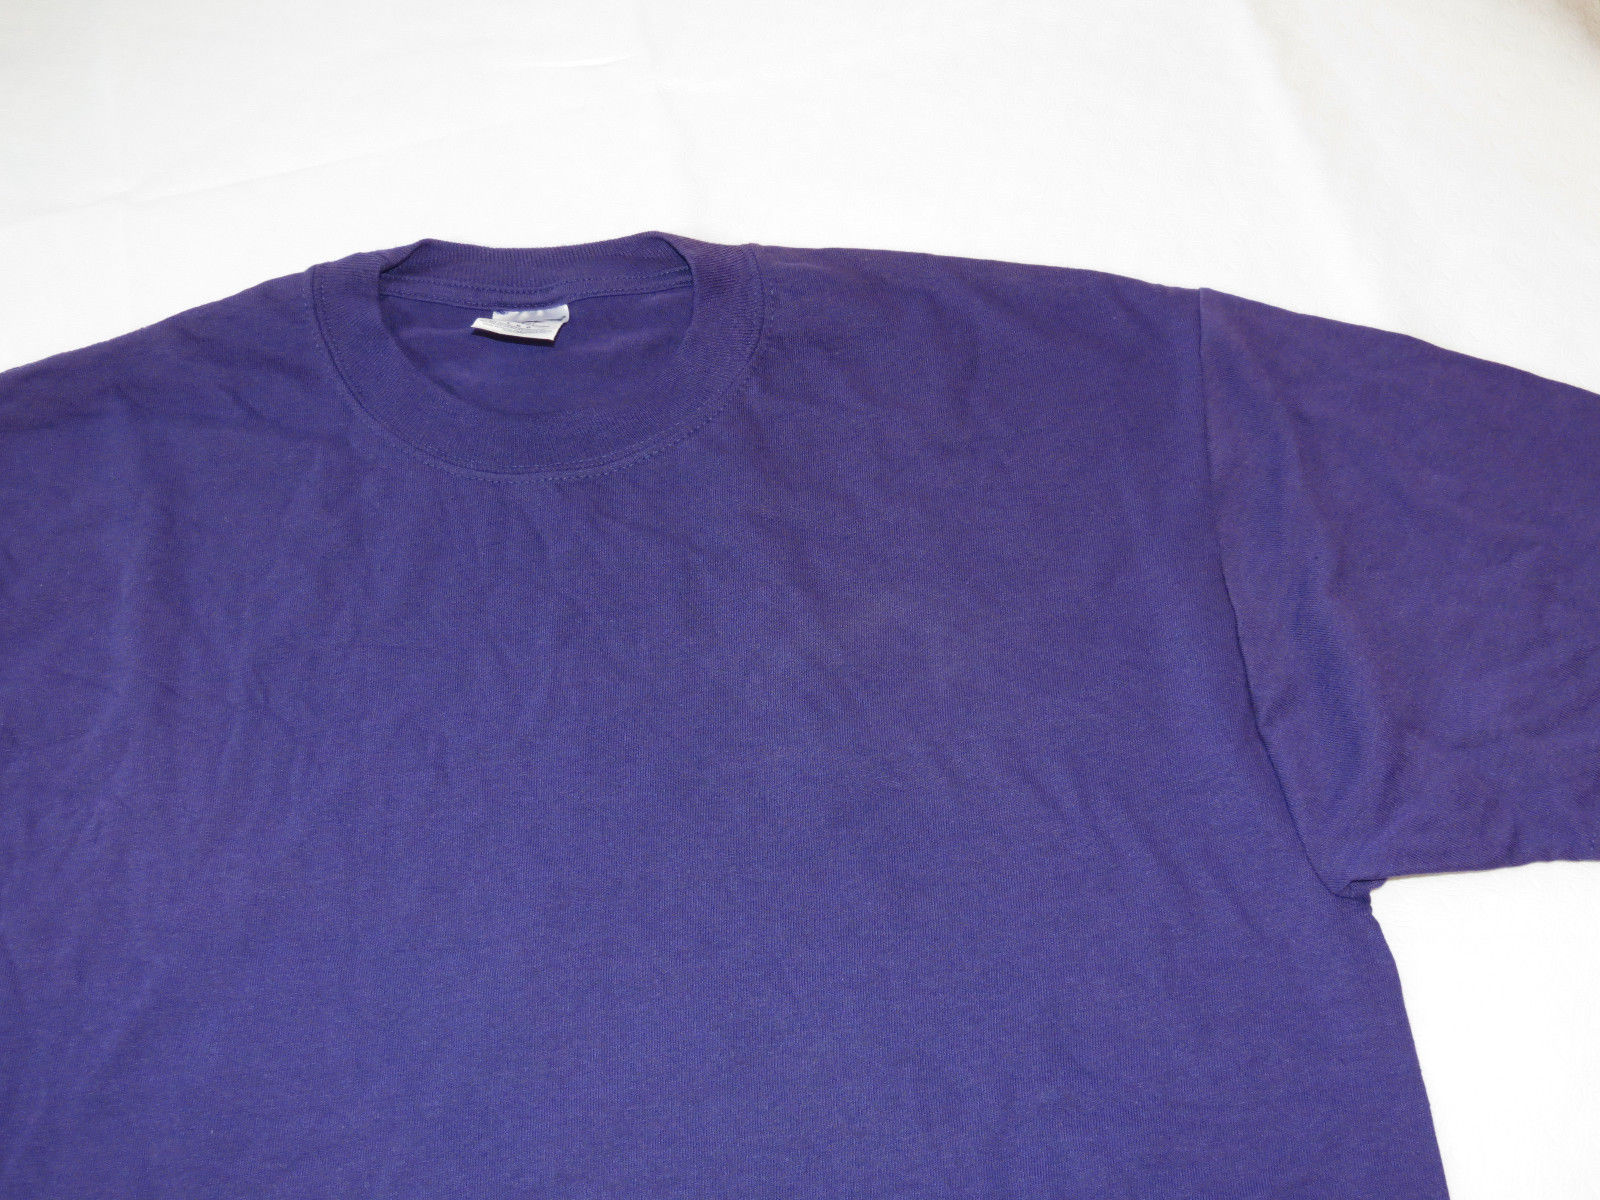 Jerzees Heavyweight Blend adult L large lg mens short sleeve shirt Purple NOS